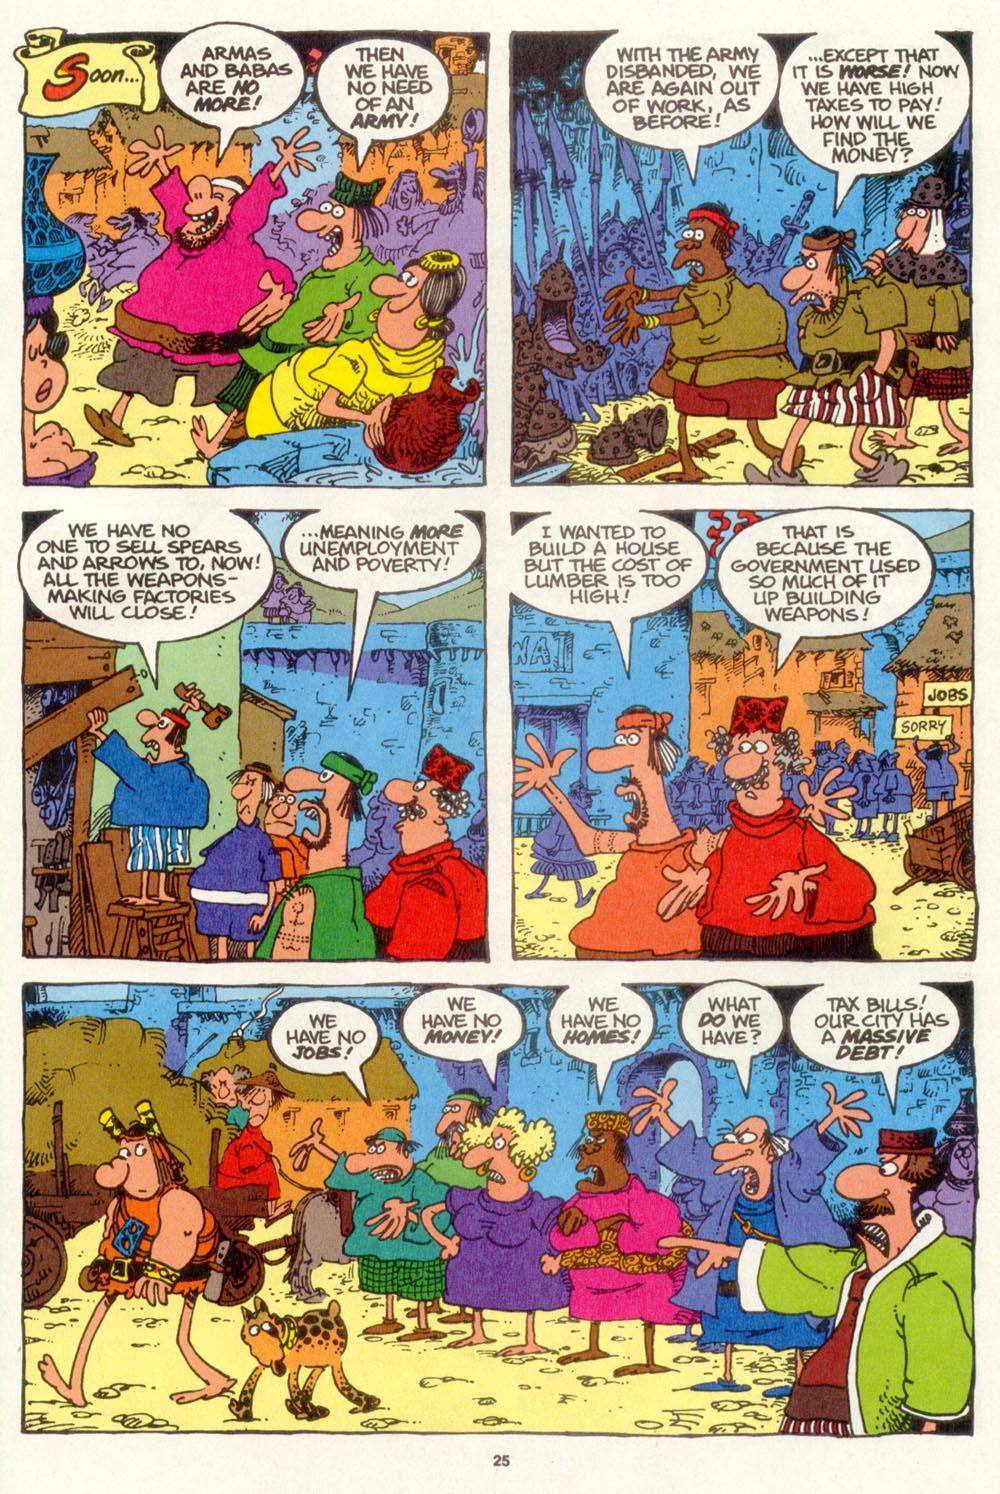 Read online Sergio Aragonés Groo the Wanderer comic -  Issue #109 - 27